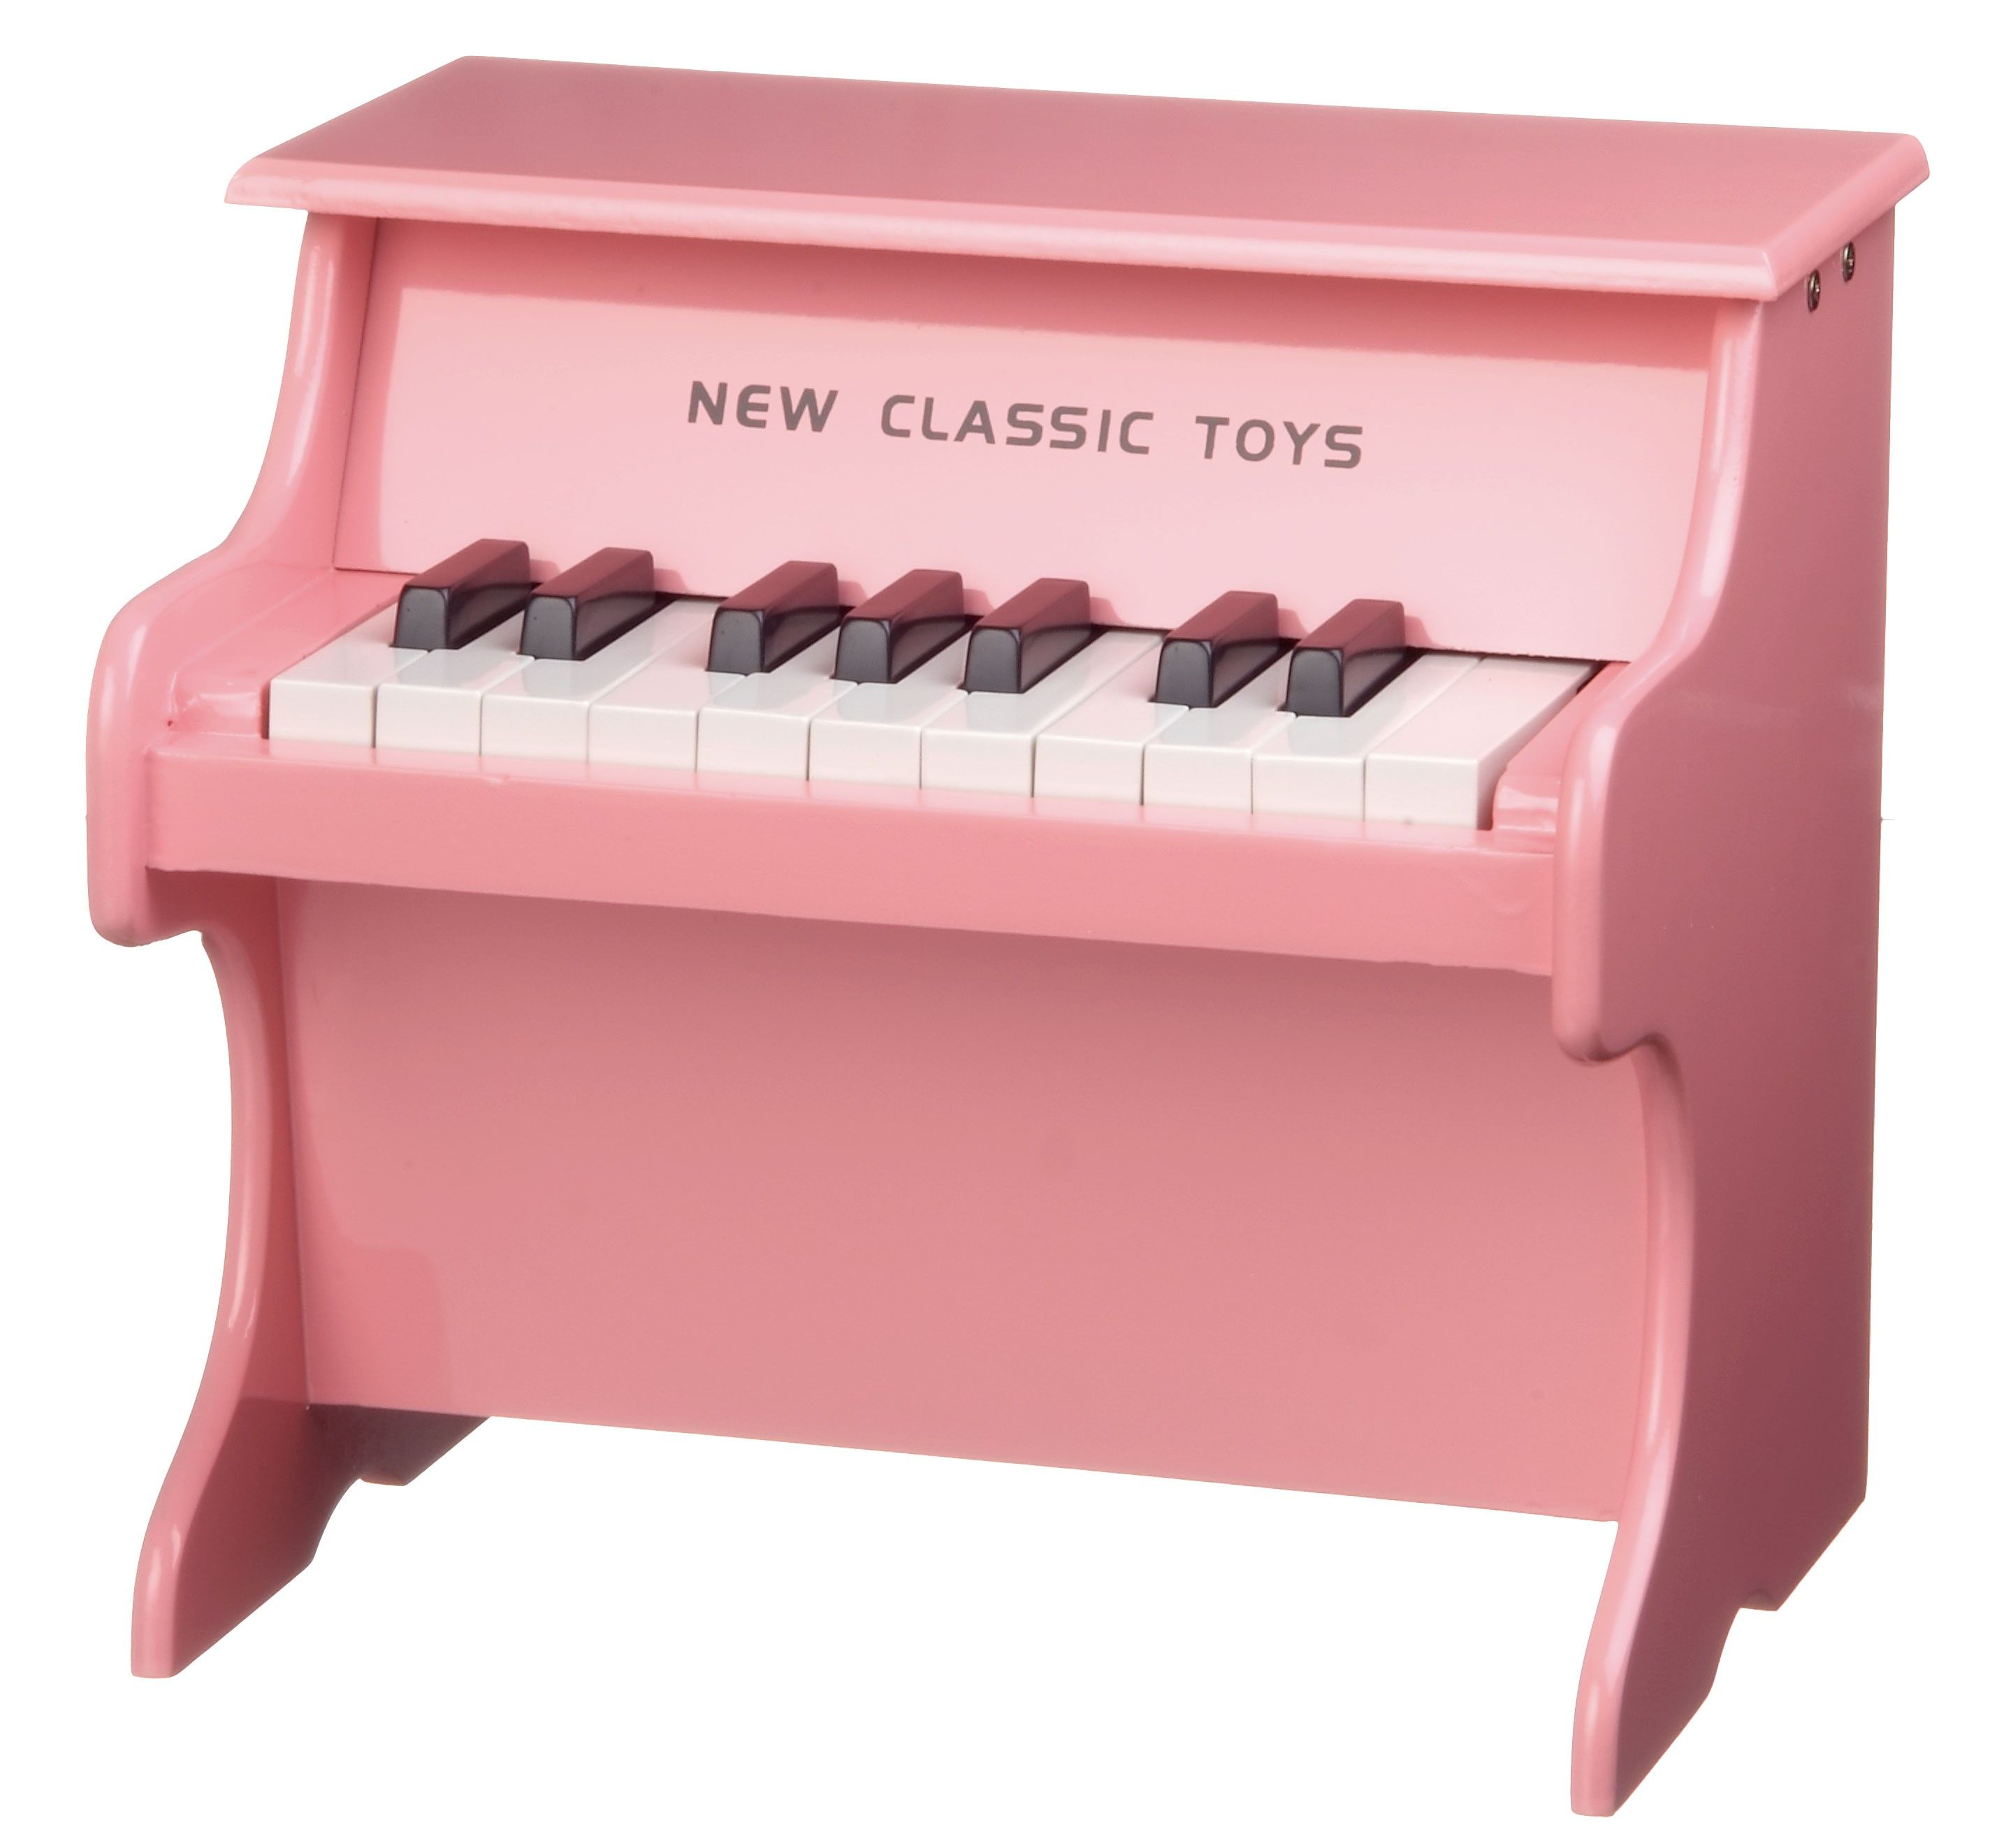 Mooie Houten Piano.Piano Roze New Classic Toys 29x28x25 Cm Nieuw Speelgoed